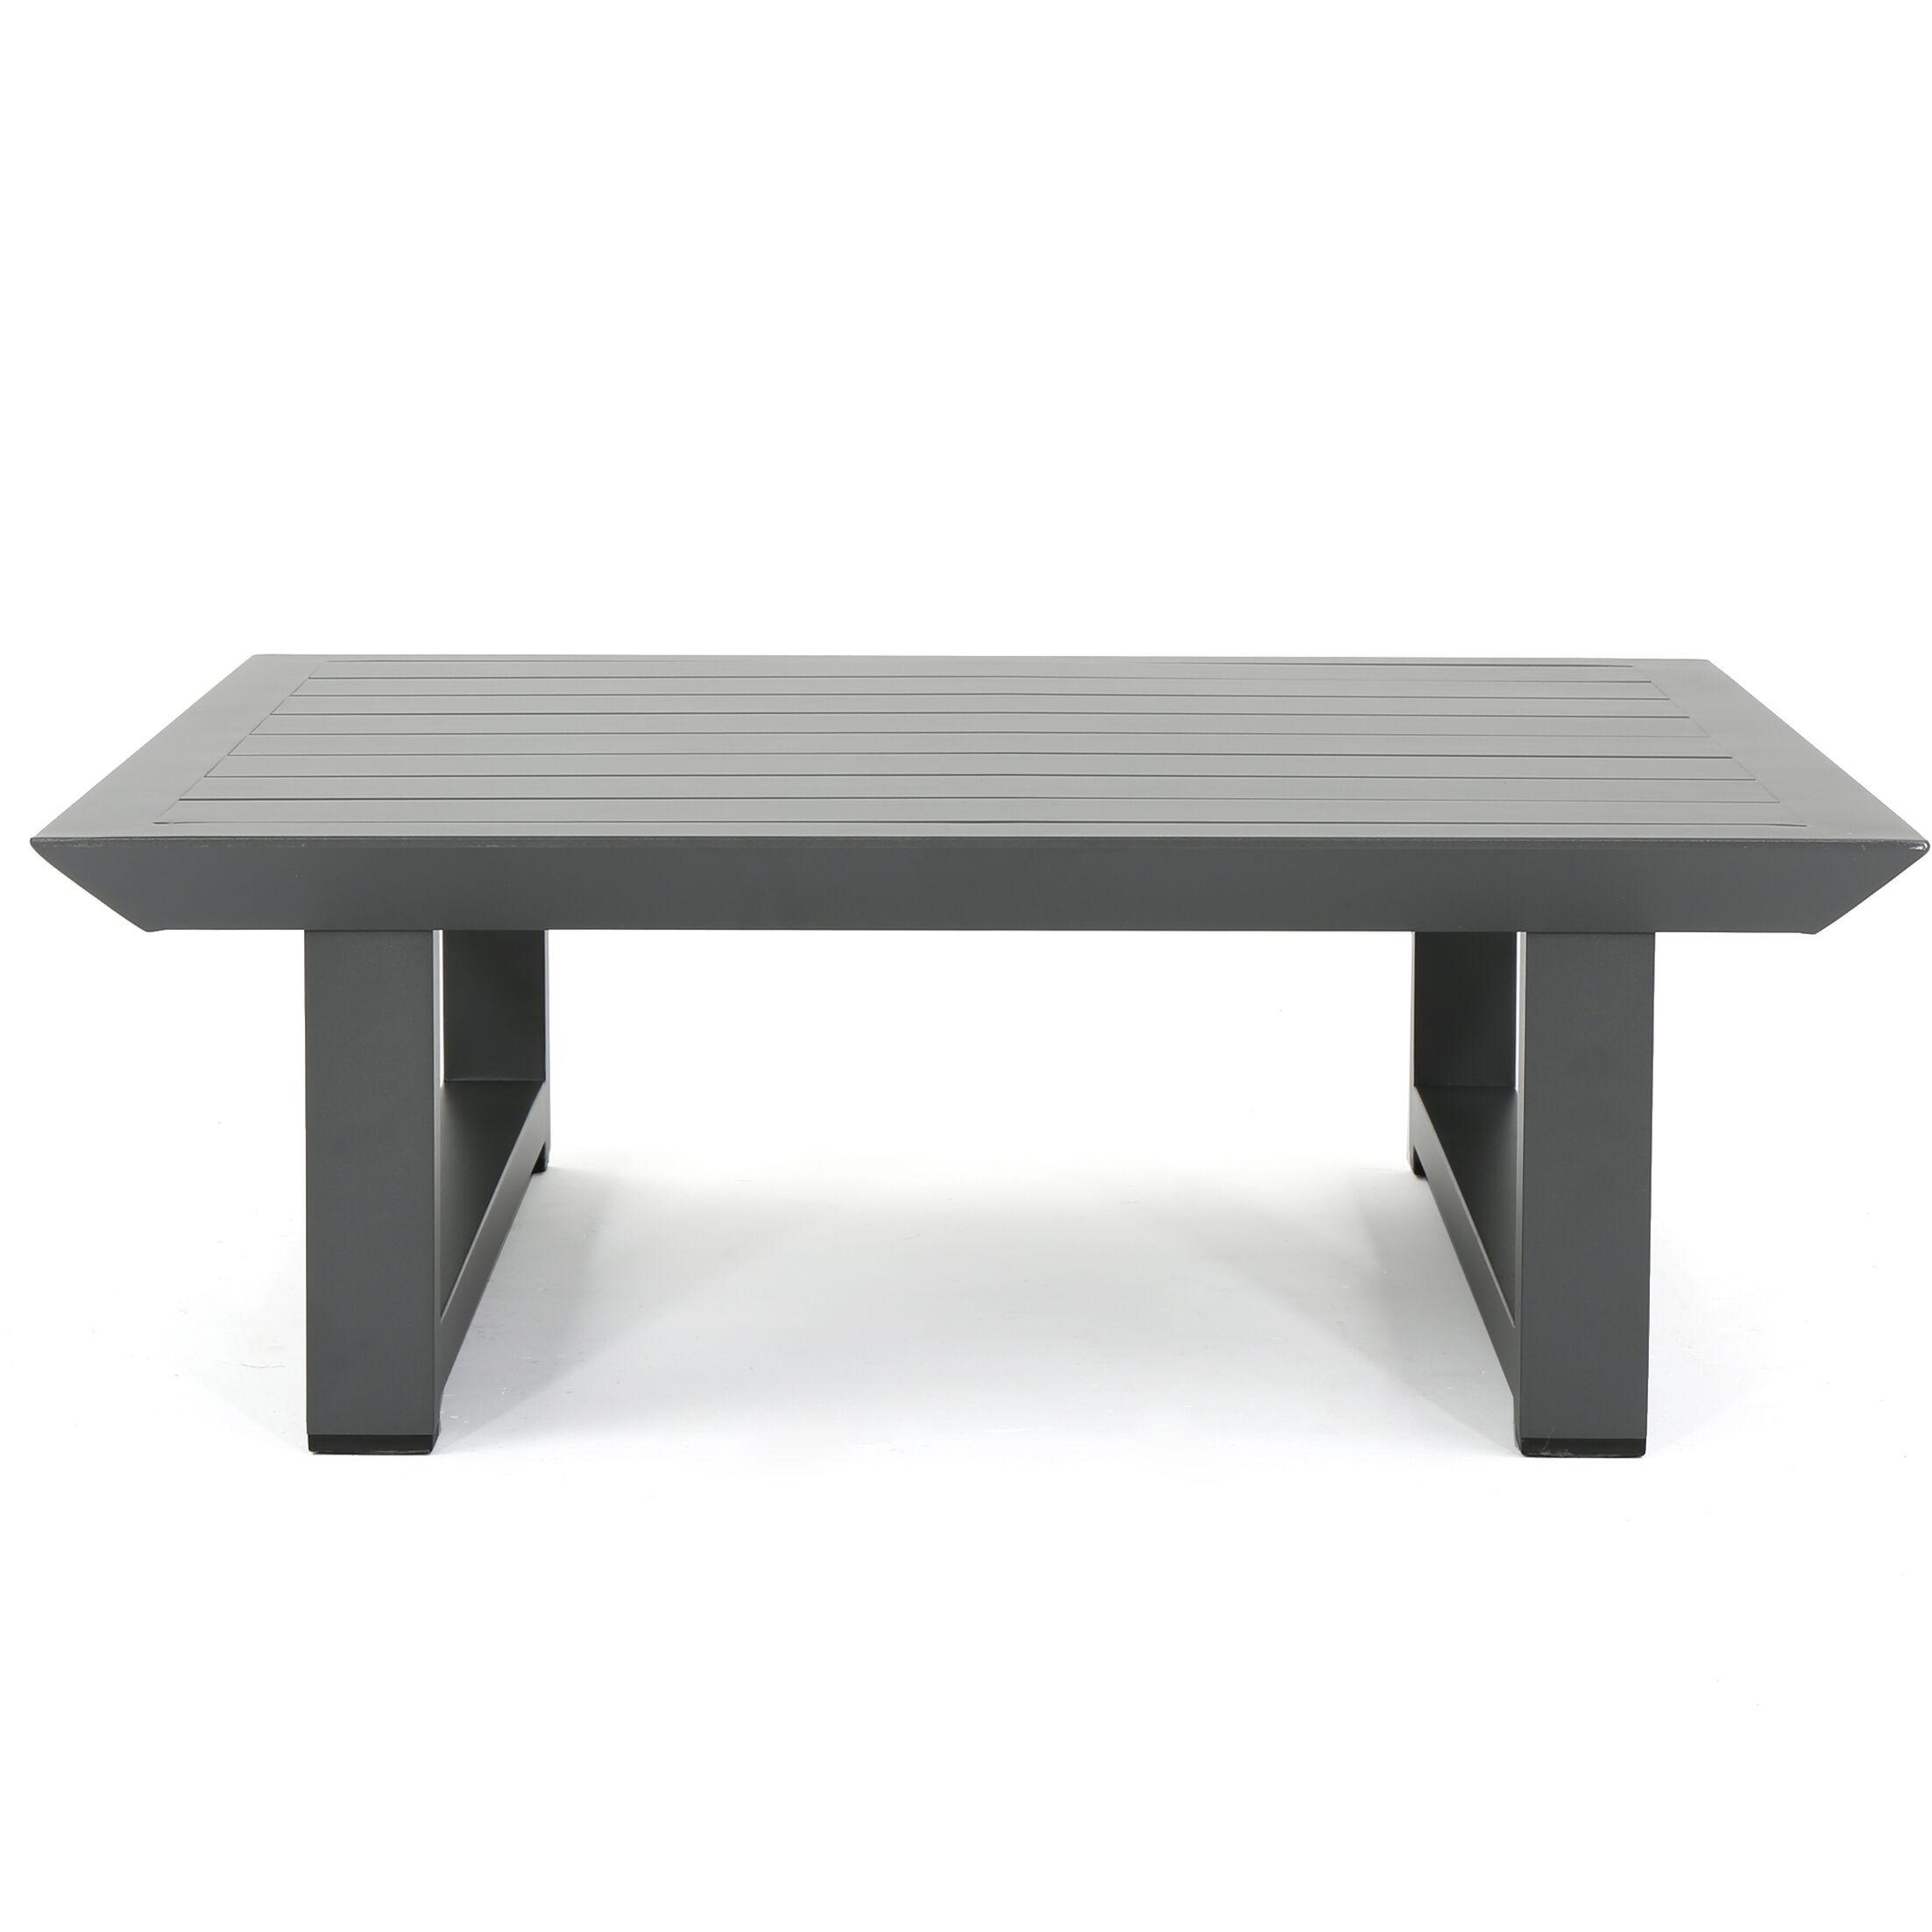 Fricks Rust-Proof Aluminum Coffee Table Color: Grey